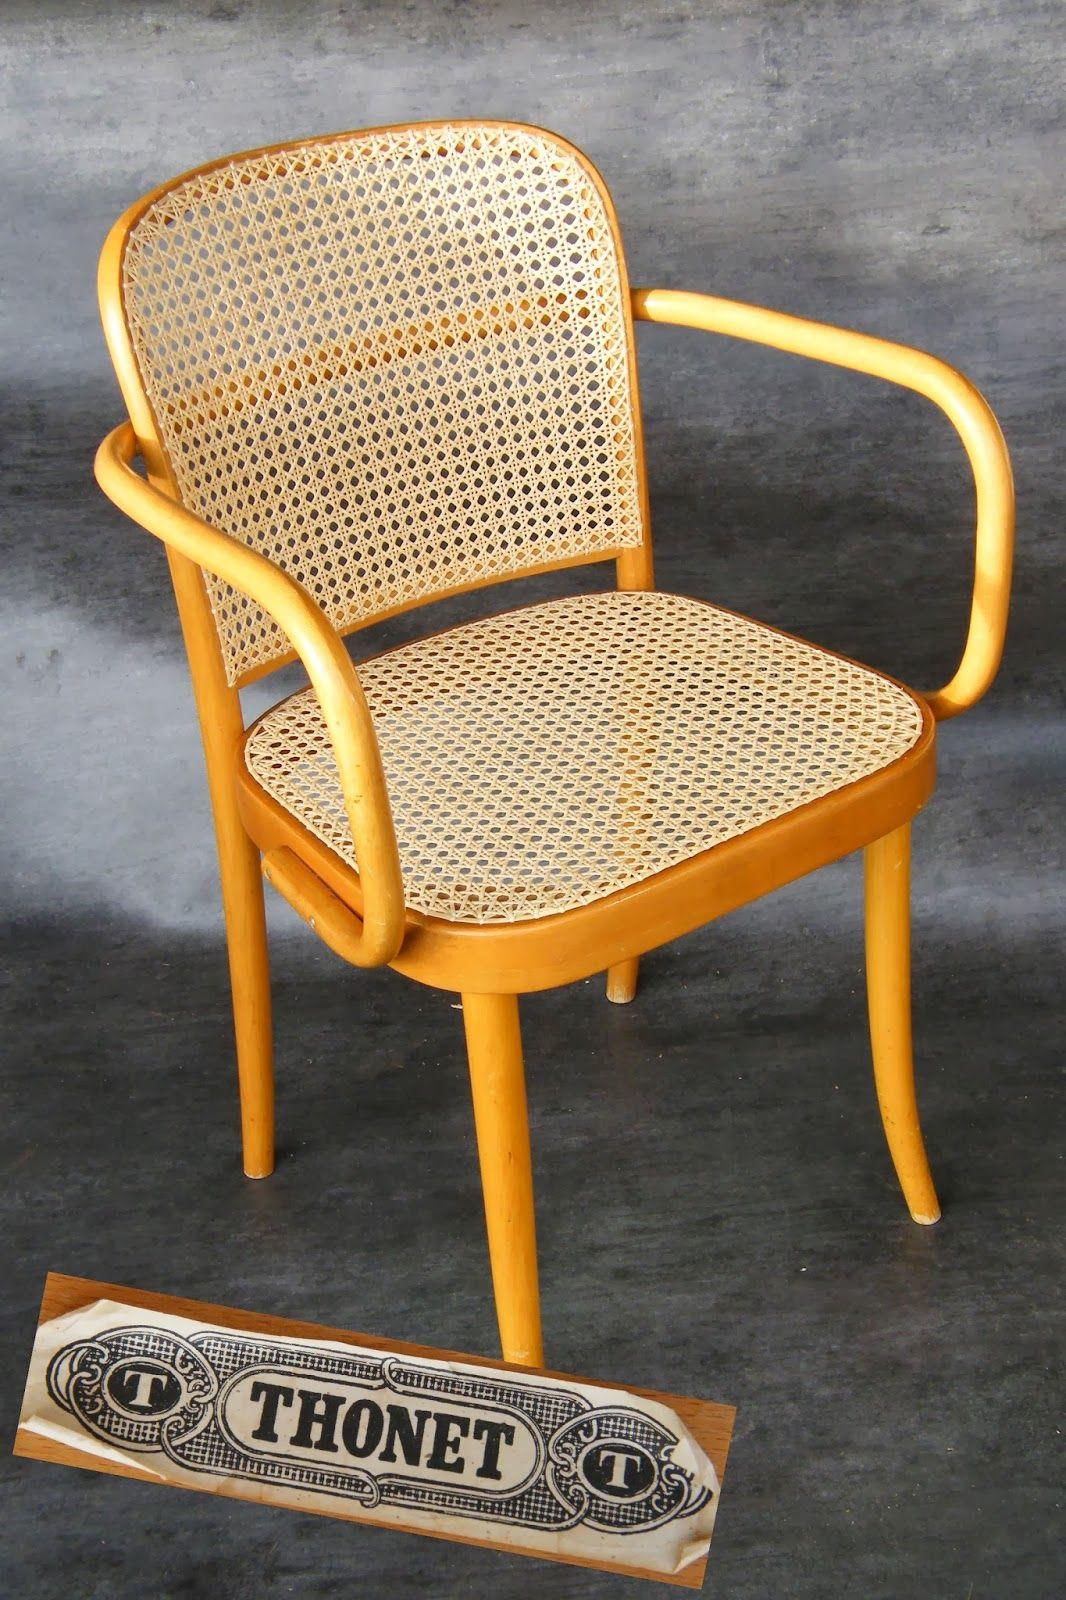 cannage rempaillage chaise tarif prix fauteuil. Black Bedroom Furniture Sets. Home Design Ideas